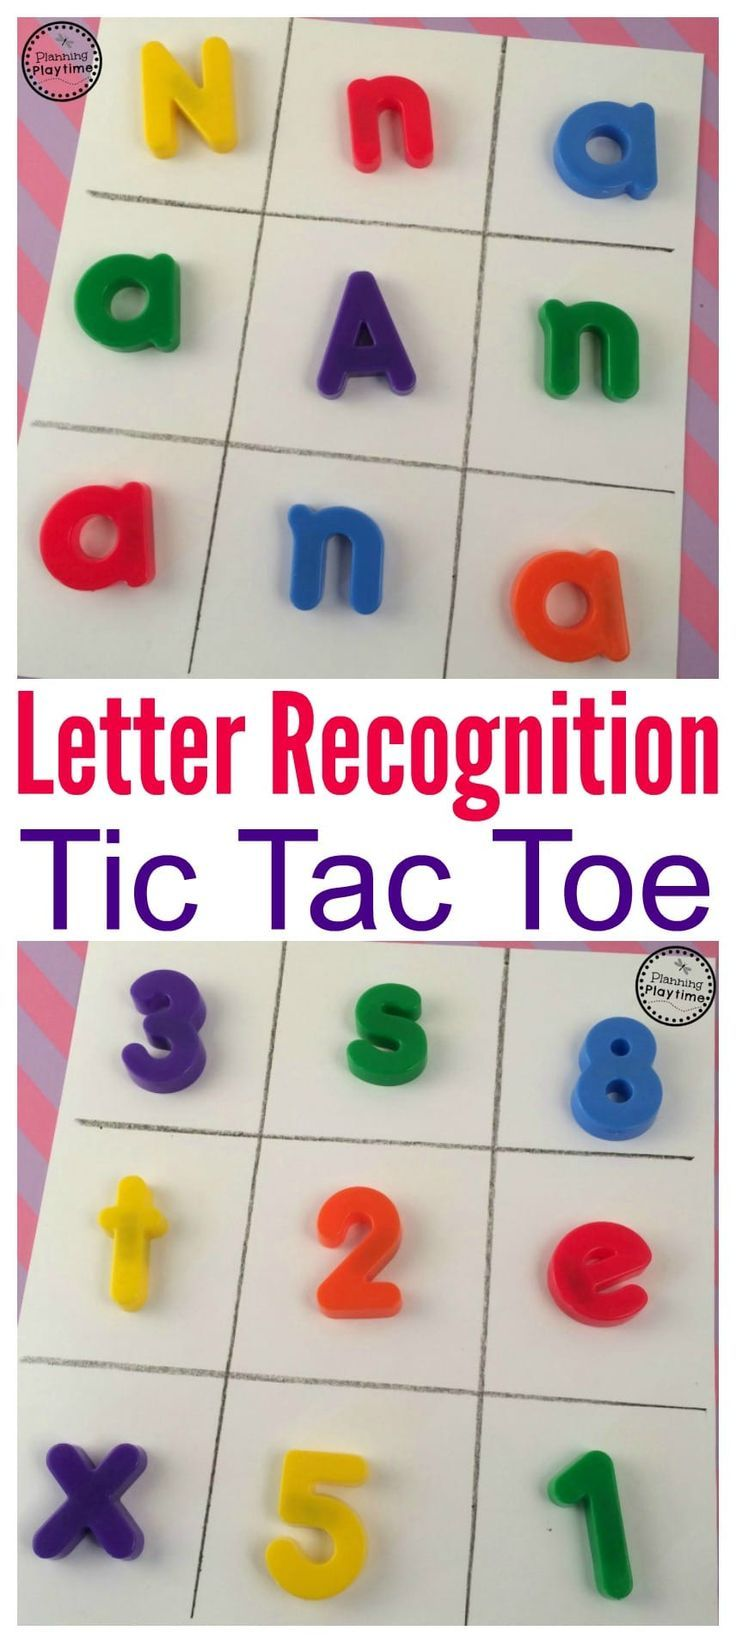 Letter Recognition Ti c Tac Toe